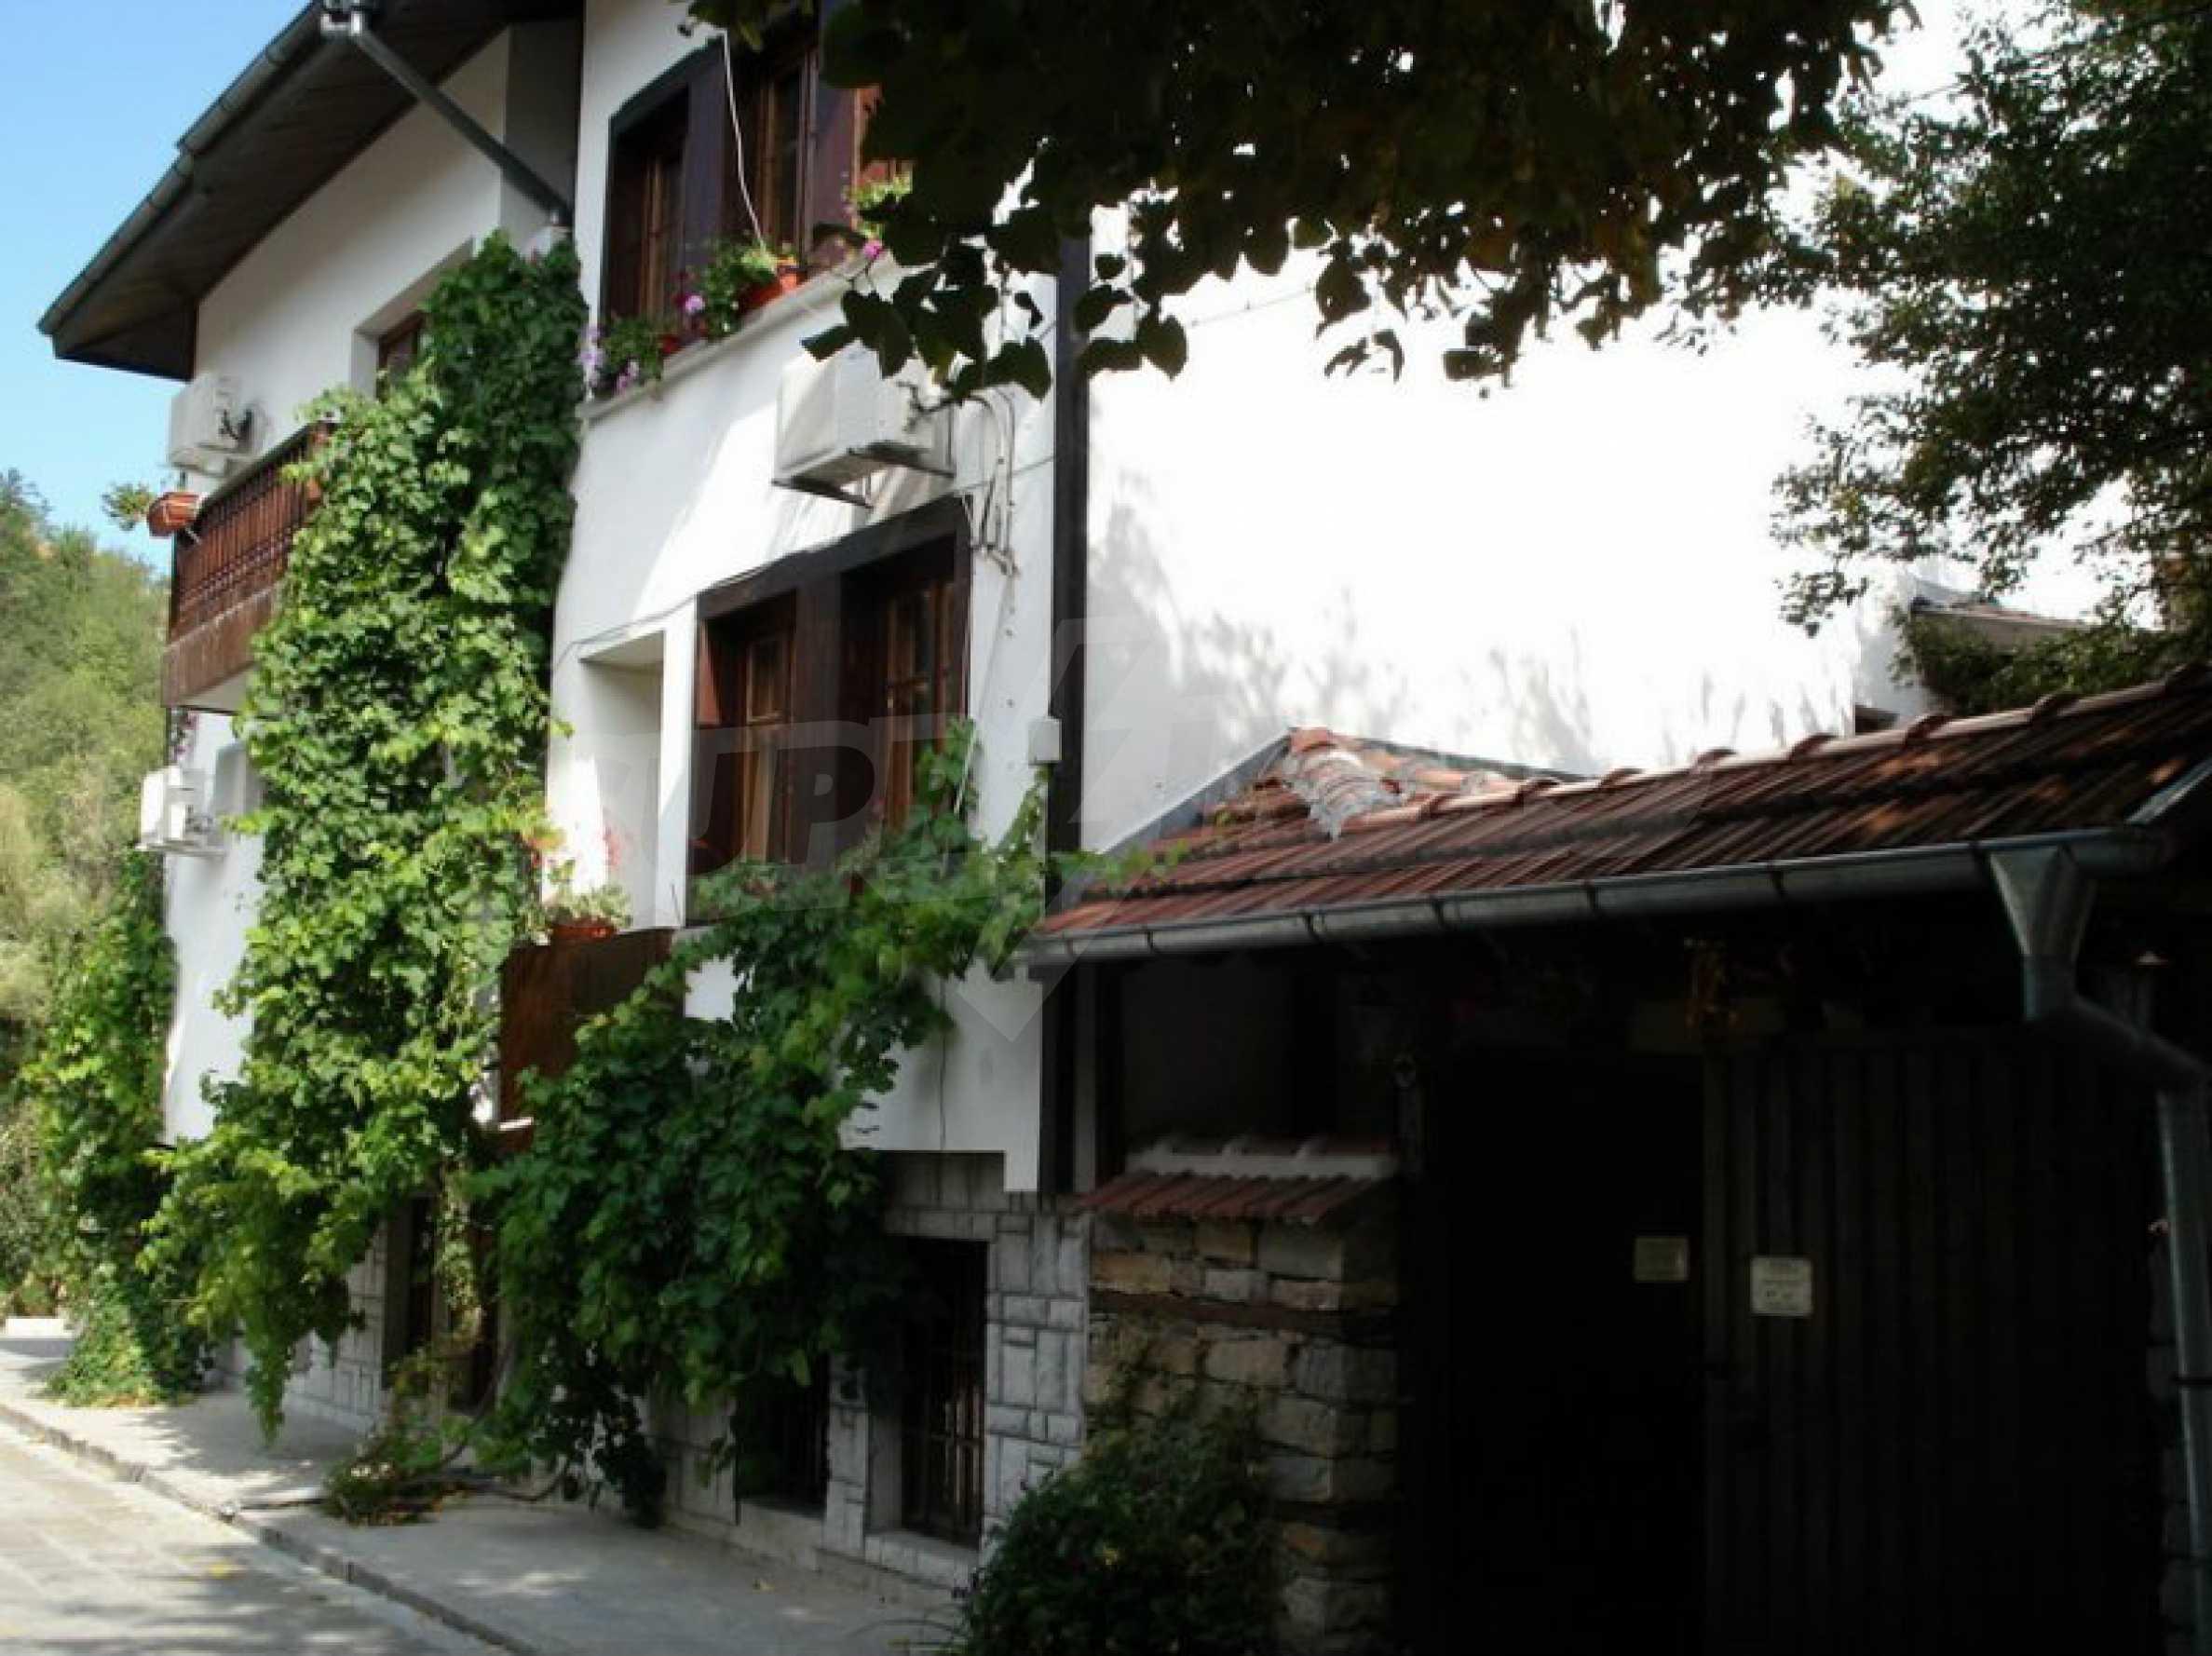 Hotelanlage mit Restaurant am Ufer des Flusses Osam in Lovech 20